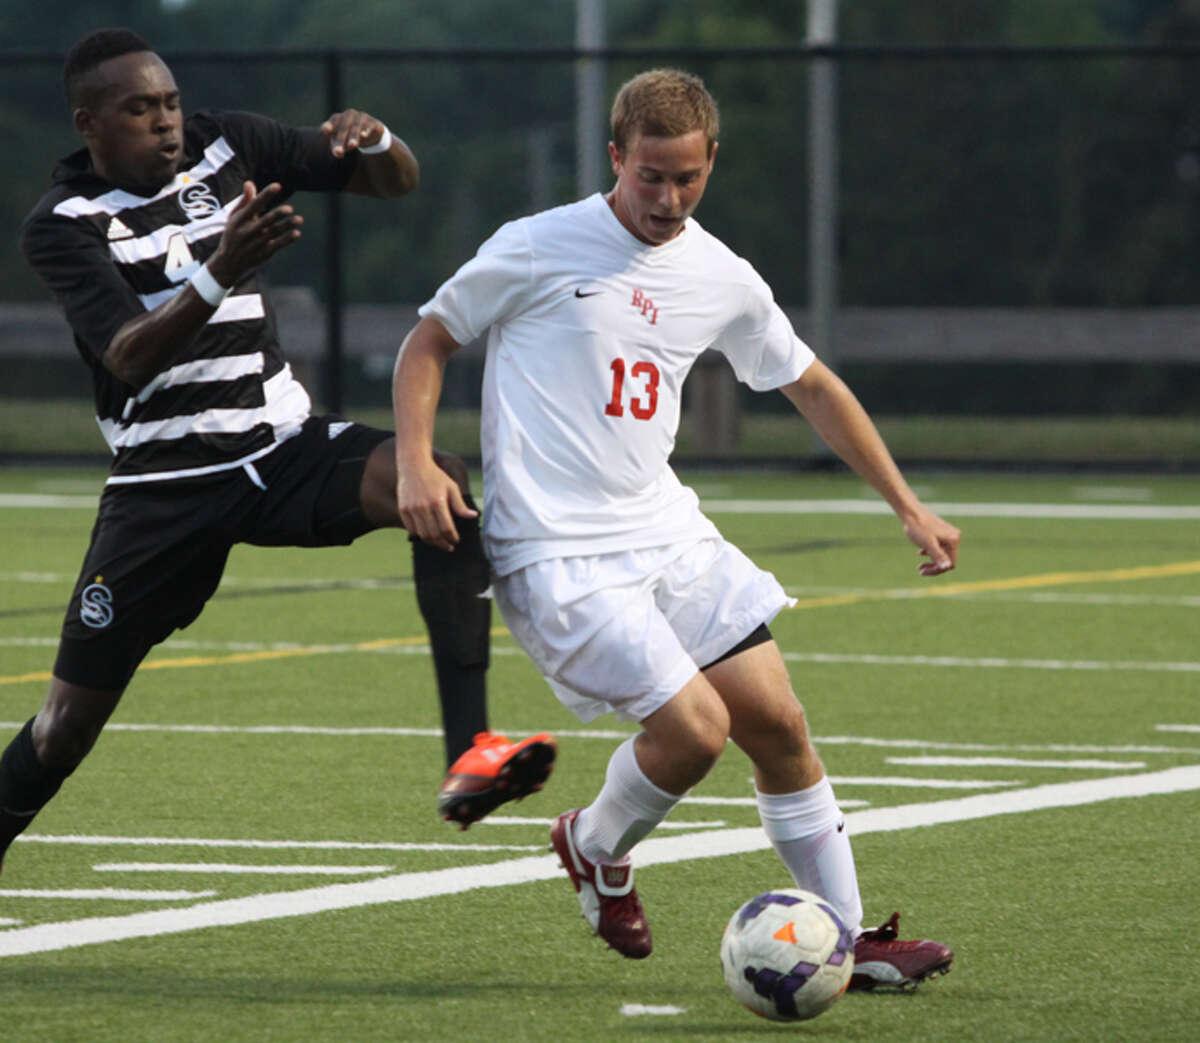 Vito Mesiti of the RPI men's soccer team. (RPI sports information)